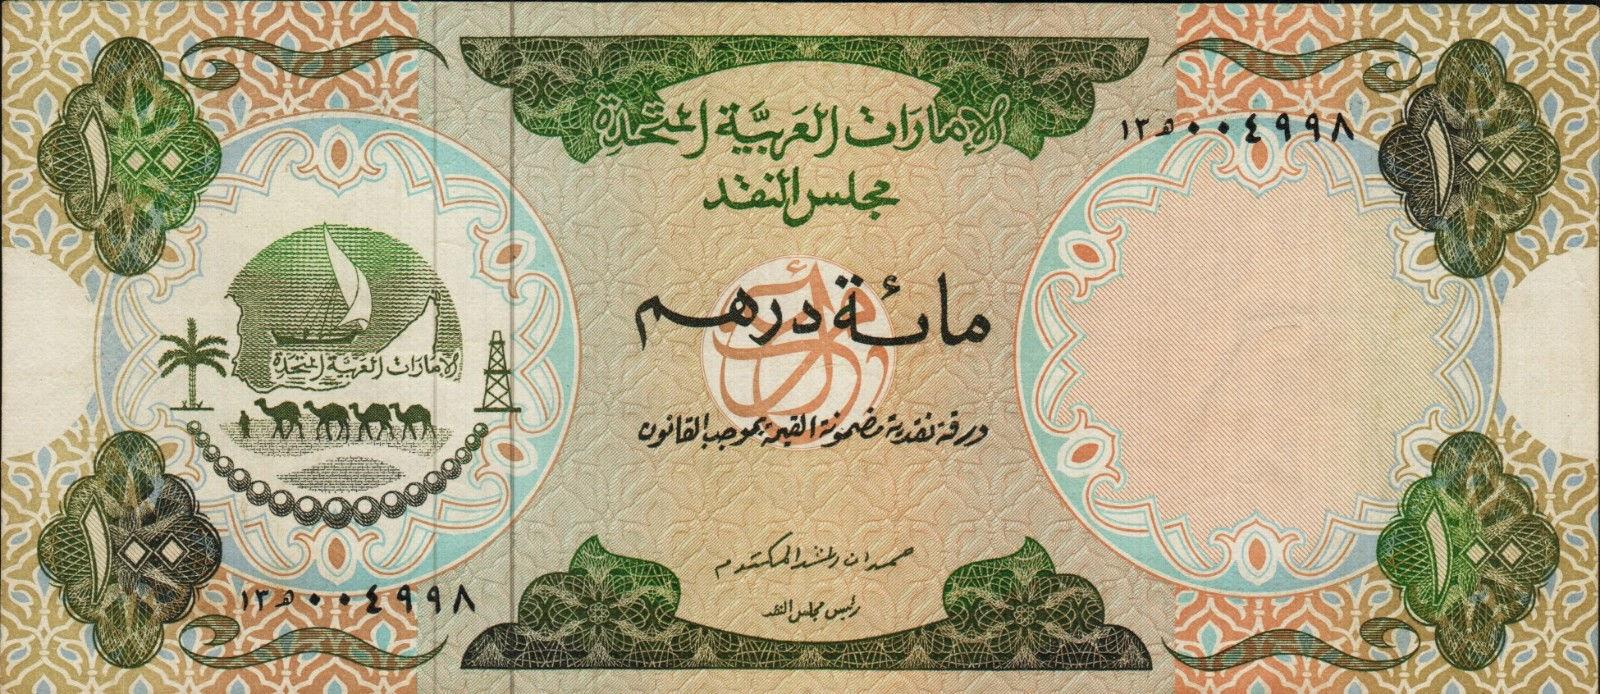 United Arab Emirates currency 100 Dirhams banknote